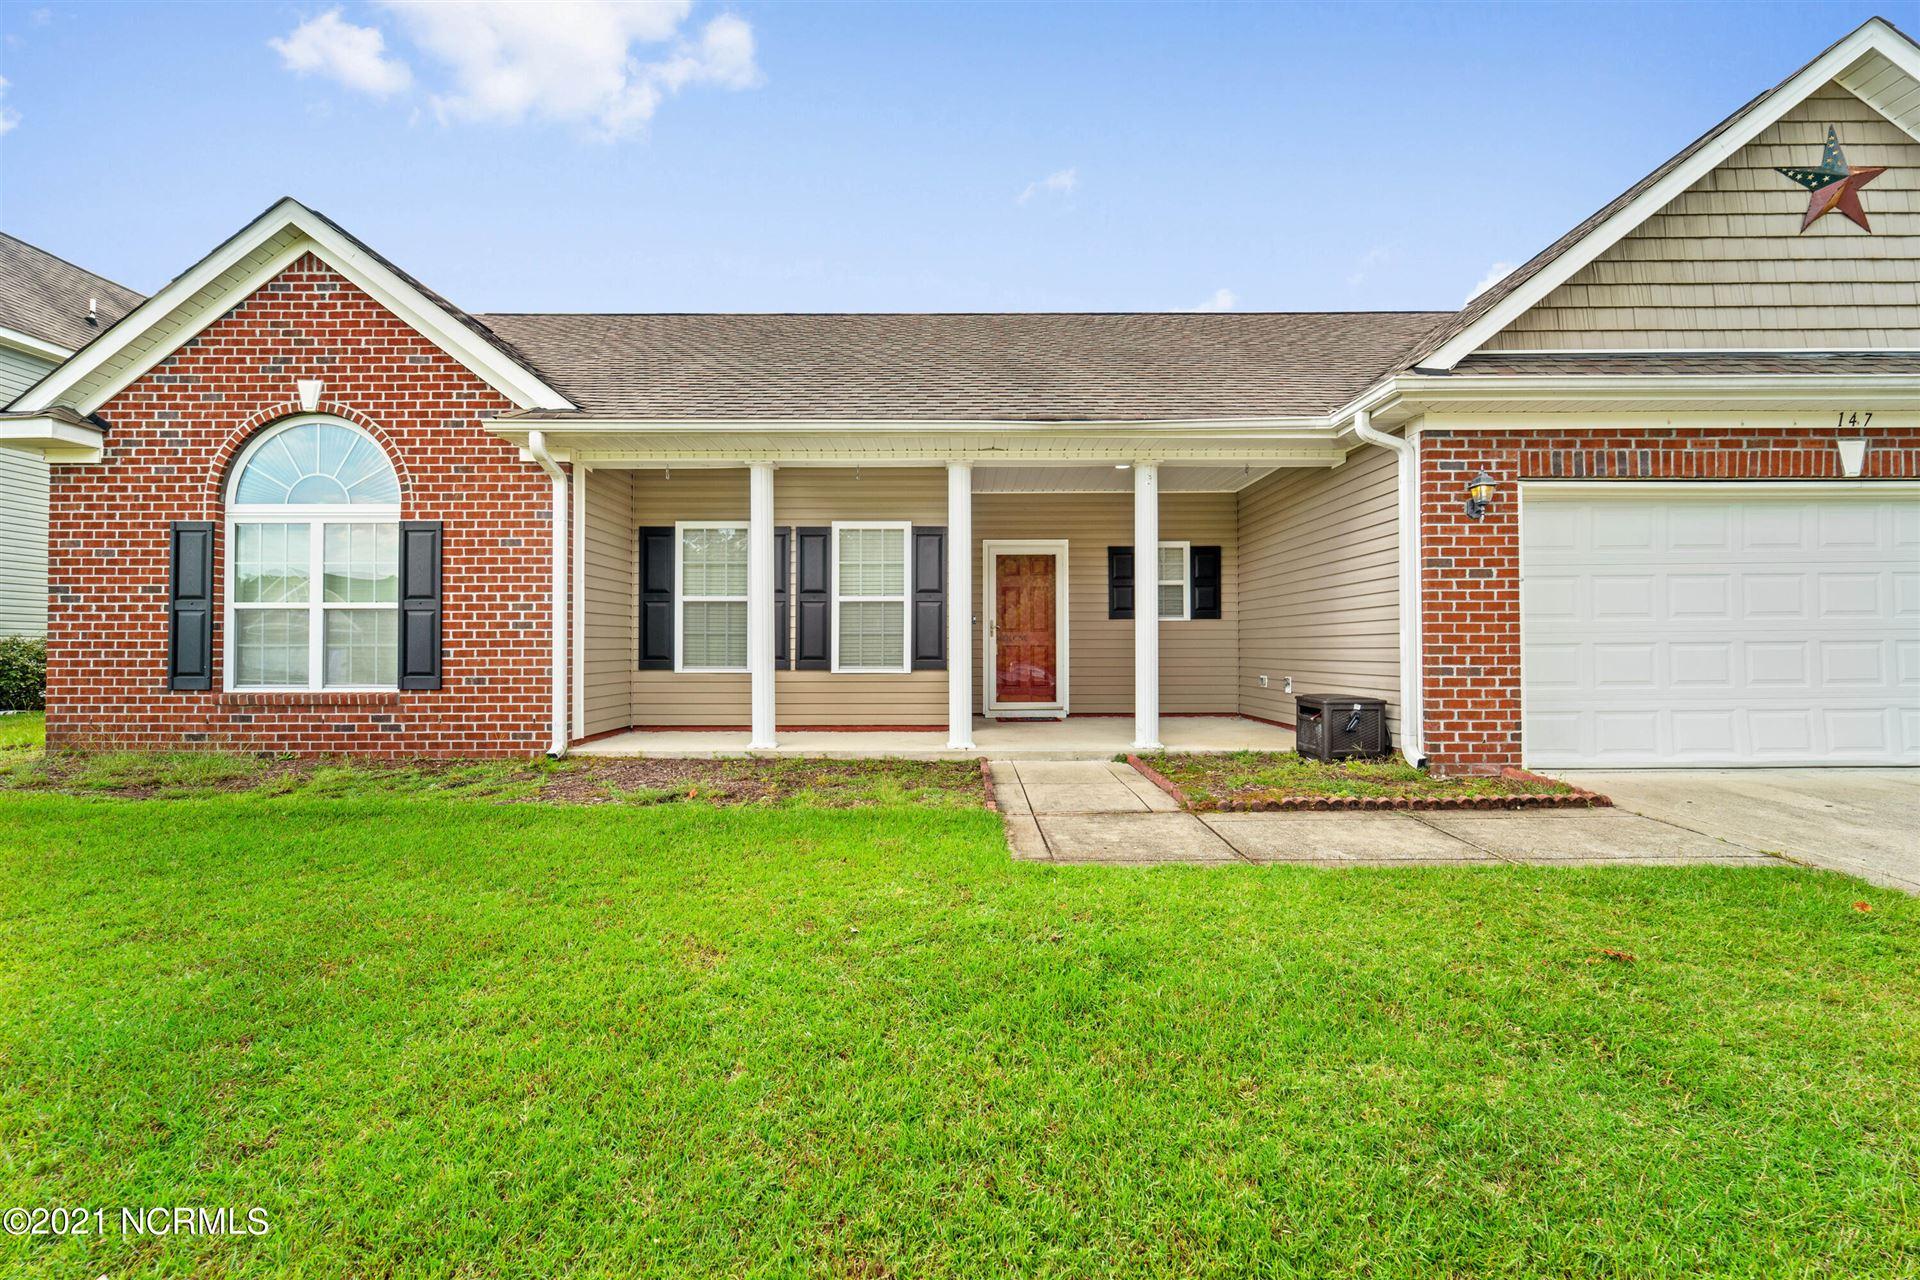 Photo of 147 Moonstone Court, Jacksonville, NC 28546 (MLS # 100293475)